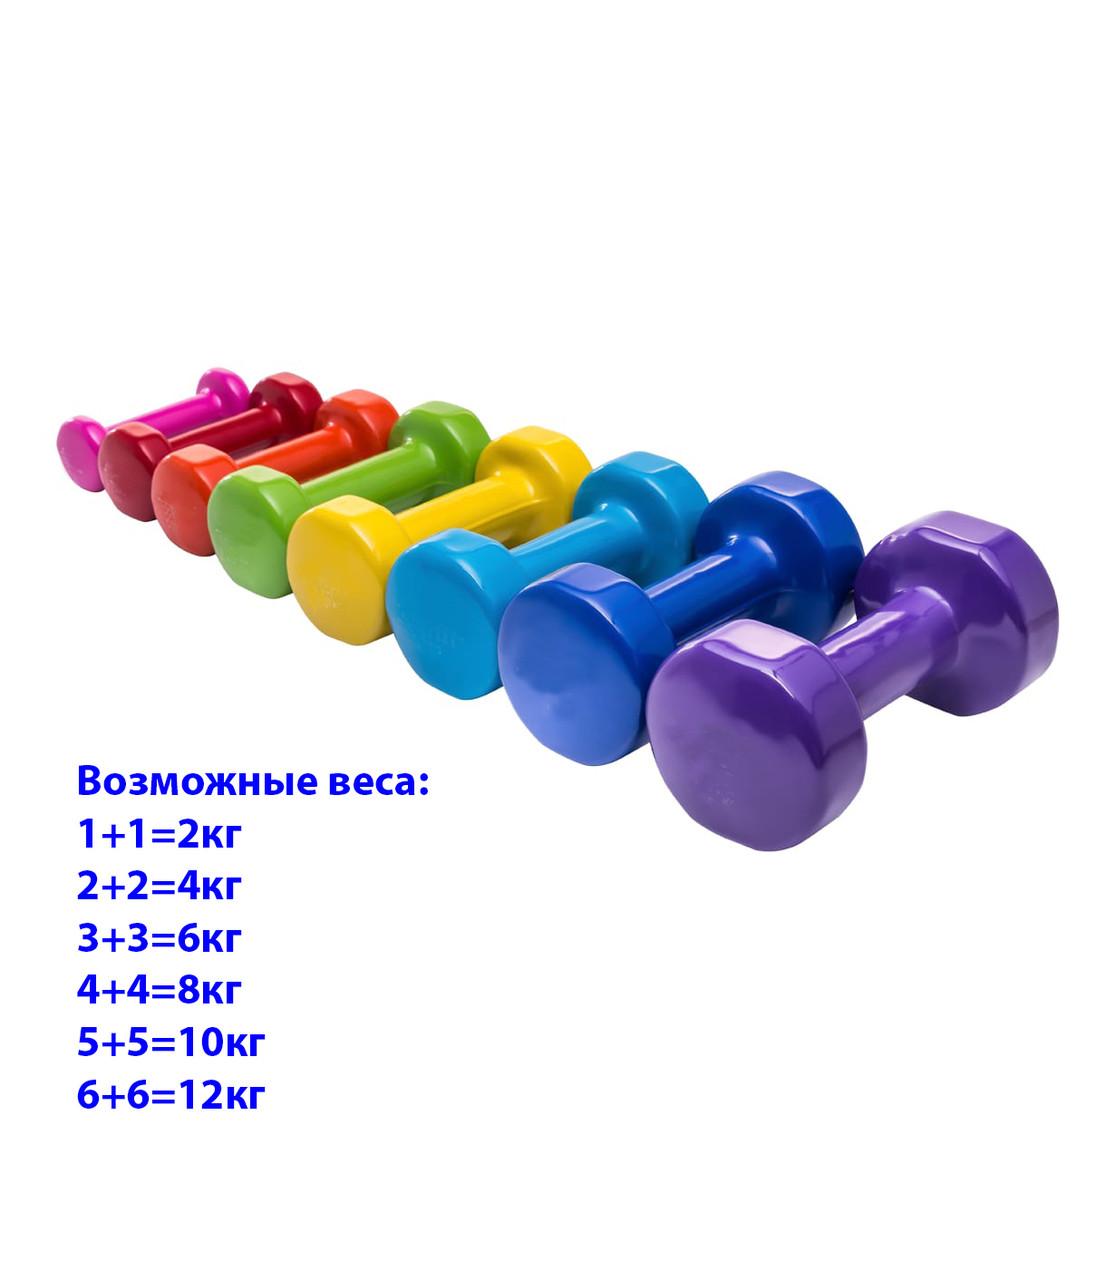 Фитнес гантели по 4кг